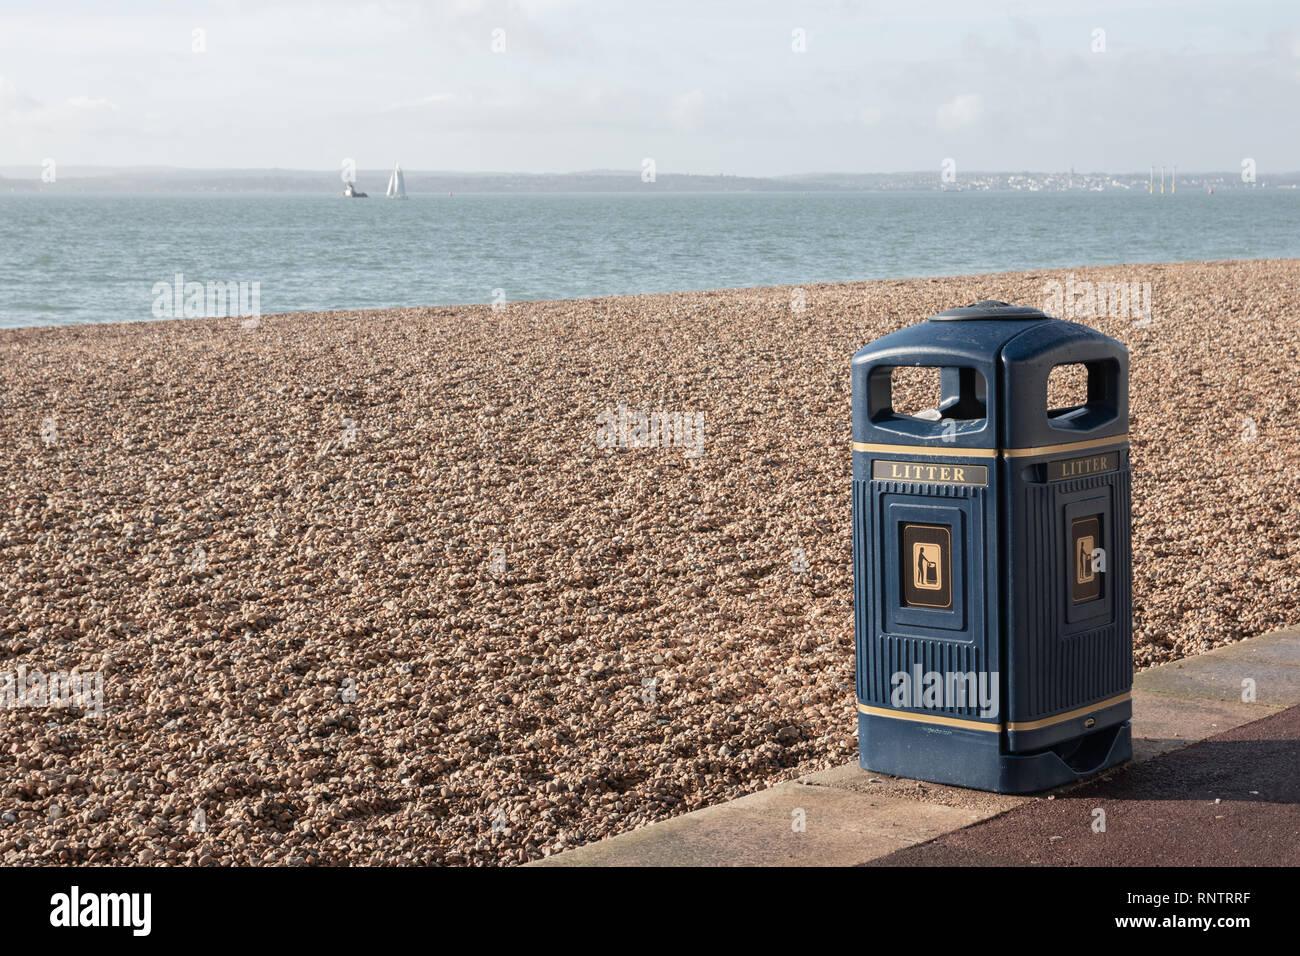 litter bin next to a pebble beach - Stock Image